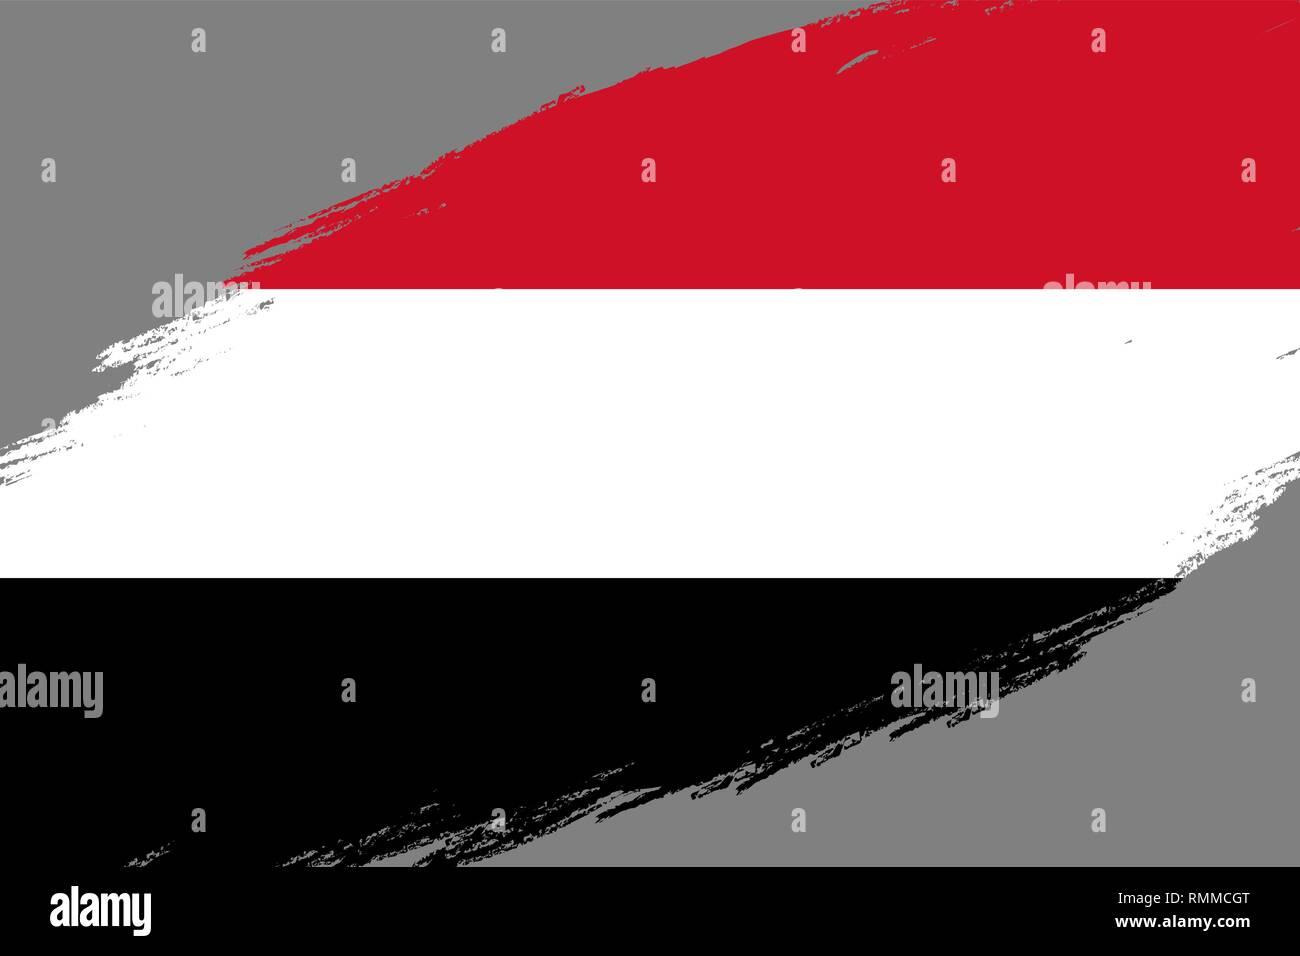 Brush stroke background with Grunge styled flag of Yemen - Stock Vector